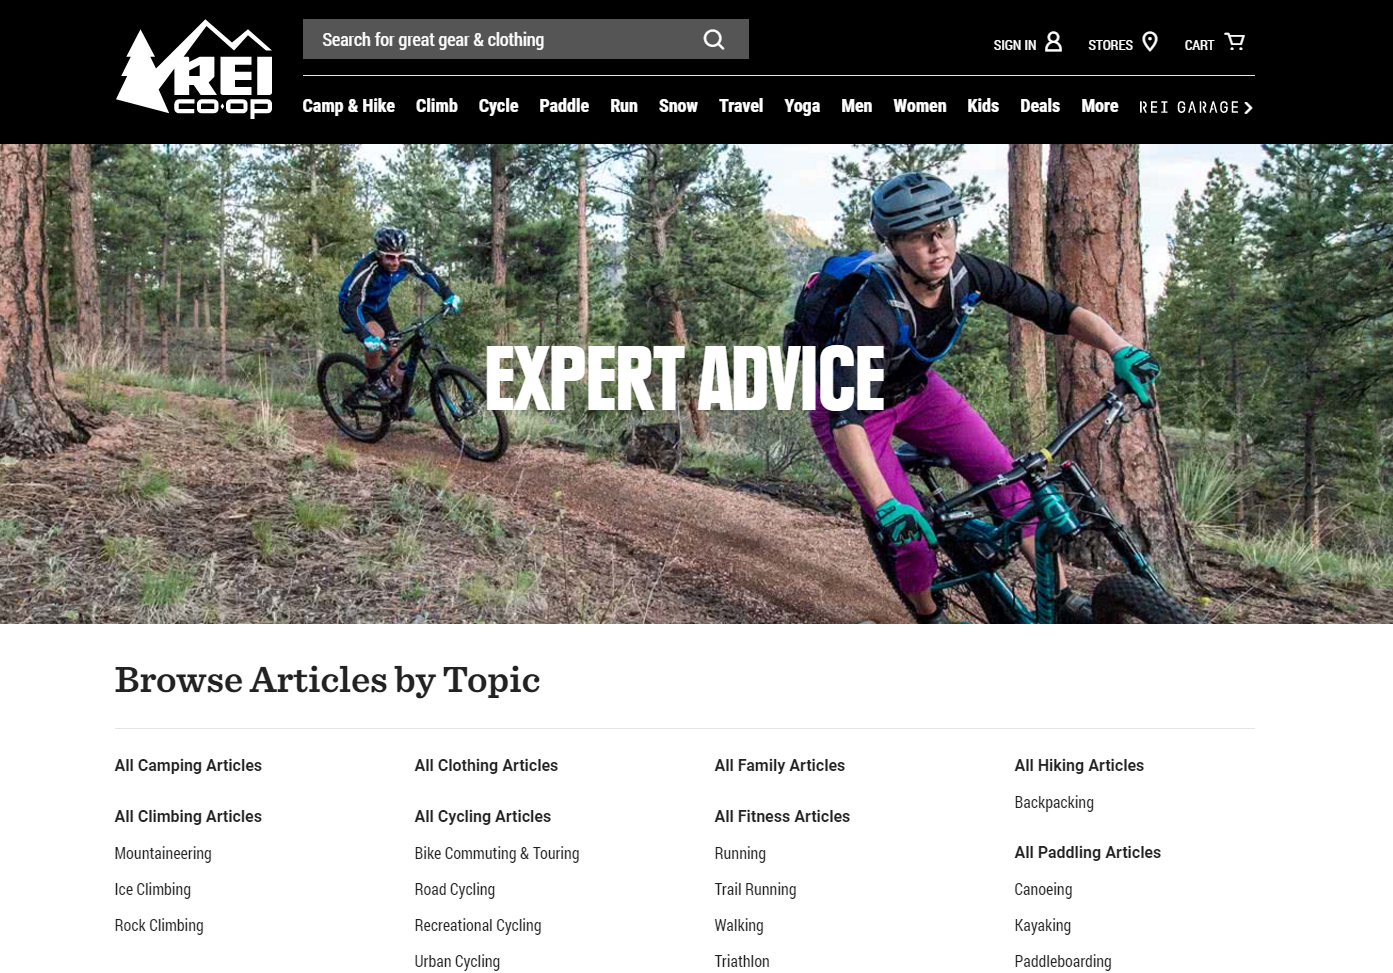 REI provides expert advice